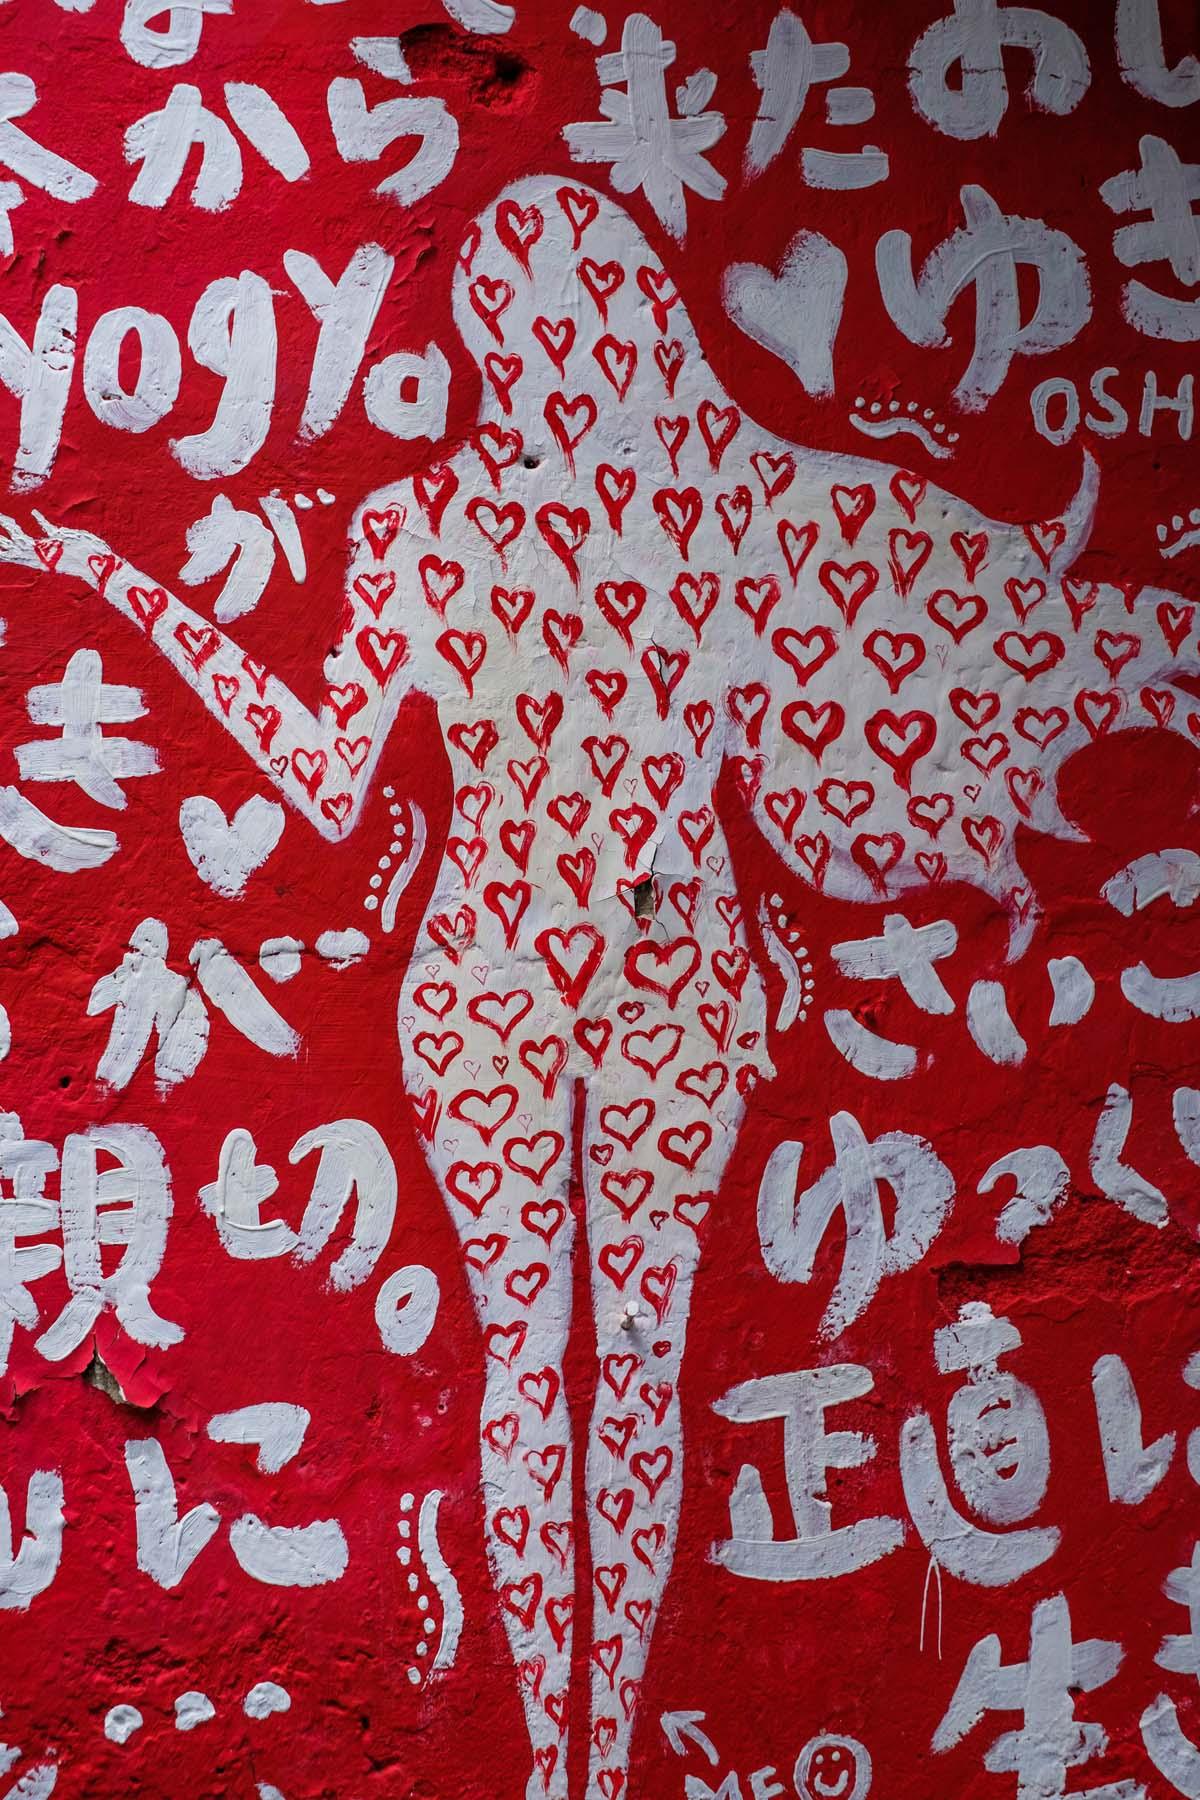 heart wall art yogyakarta indonesia